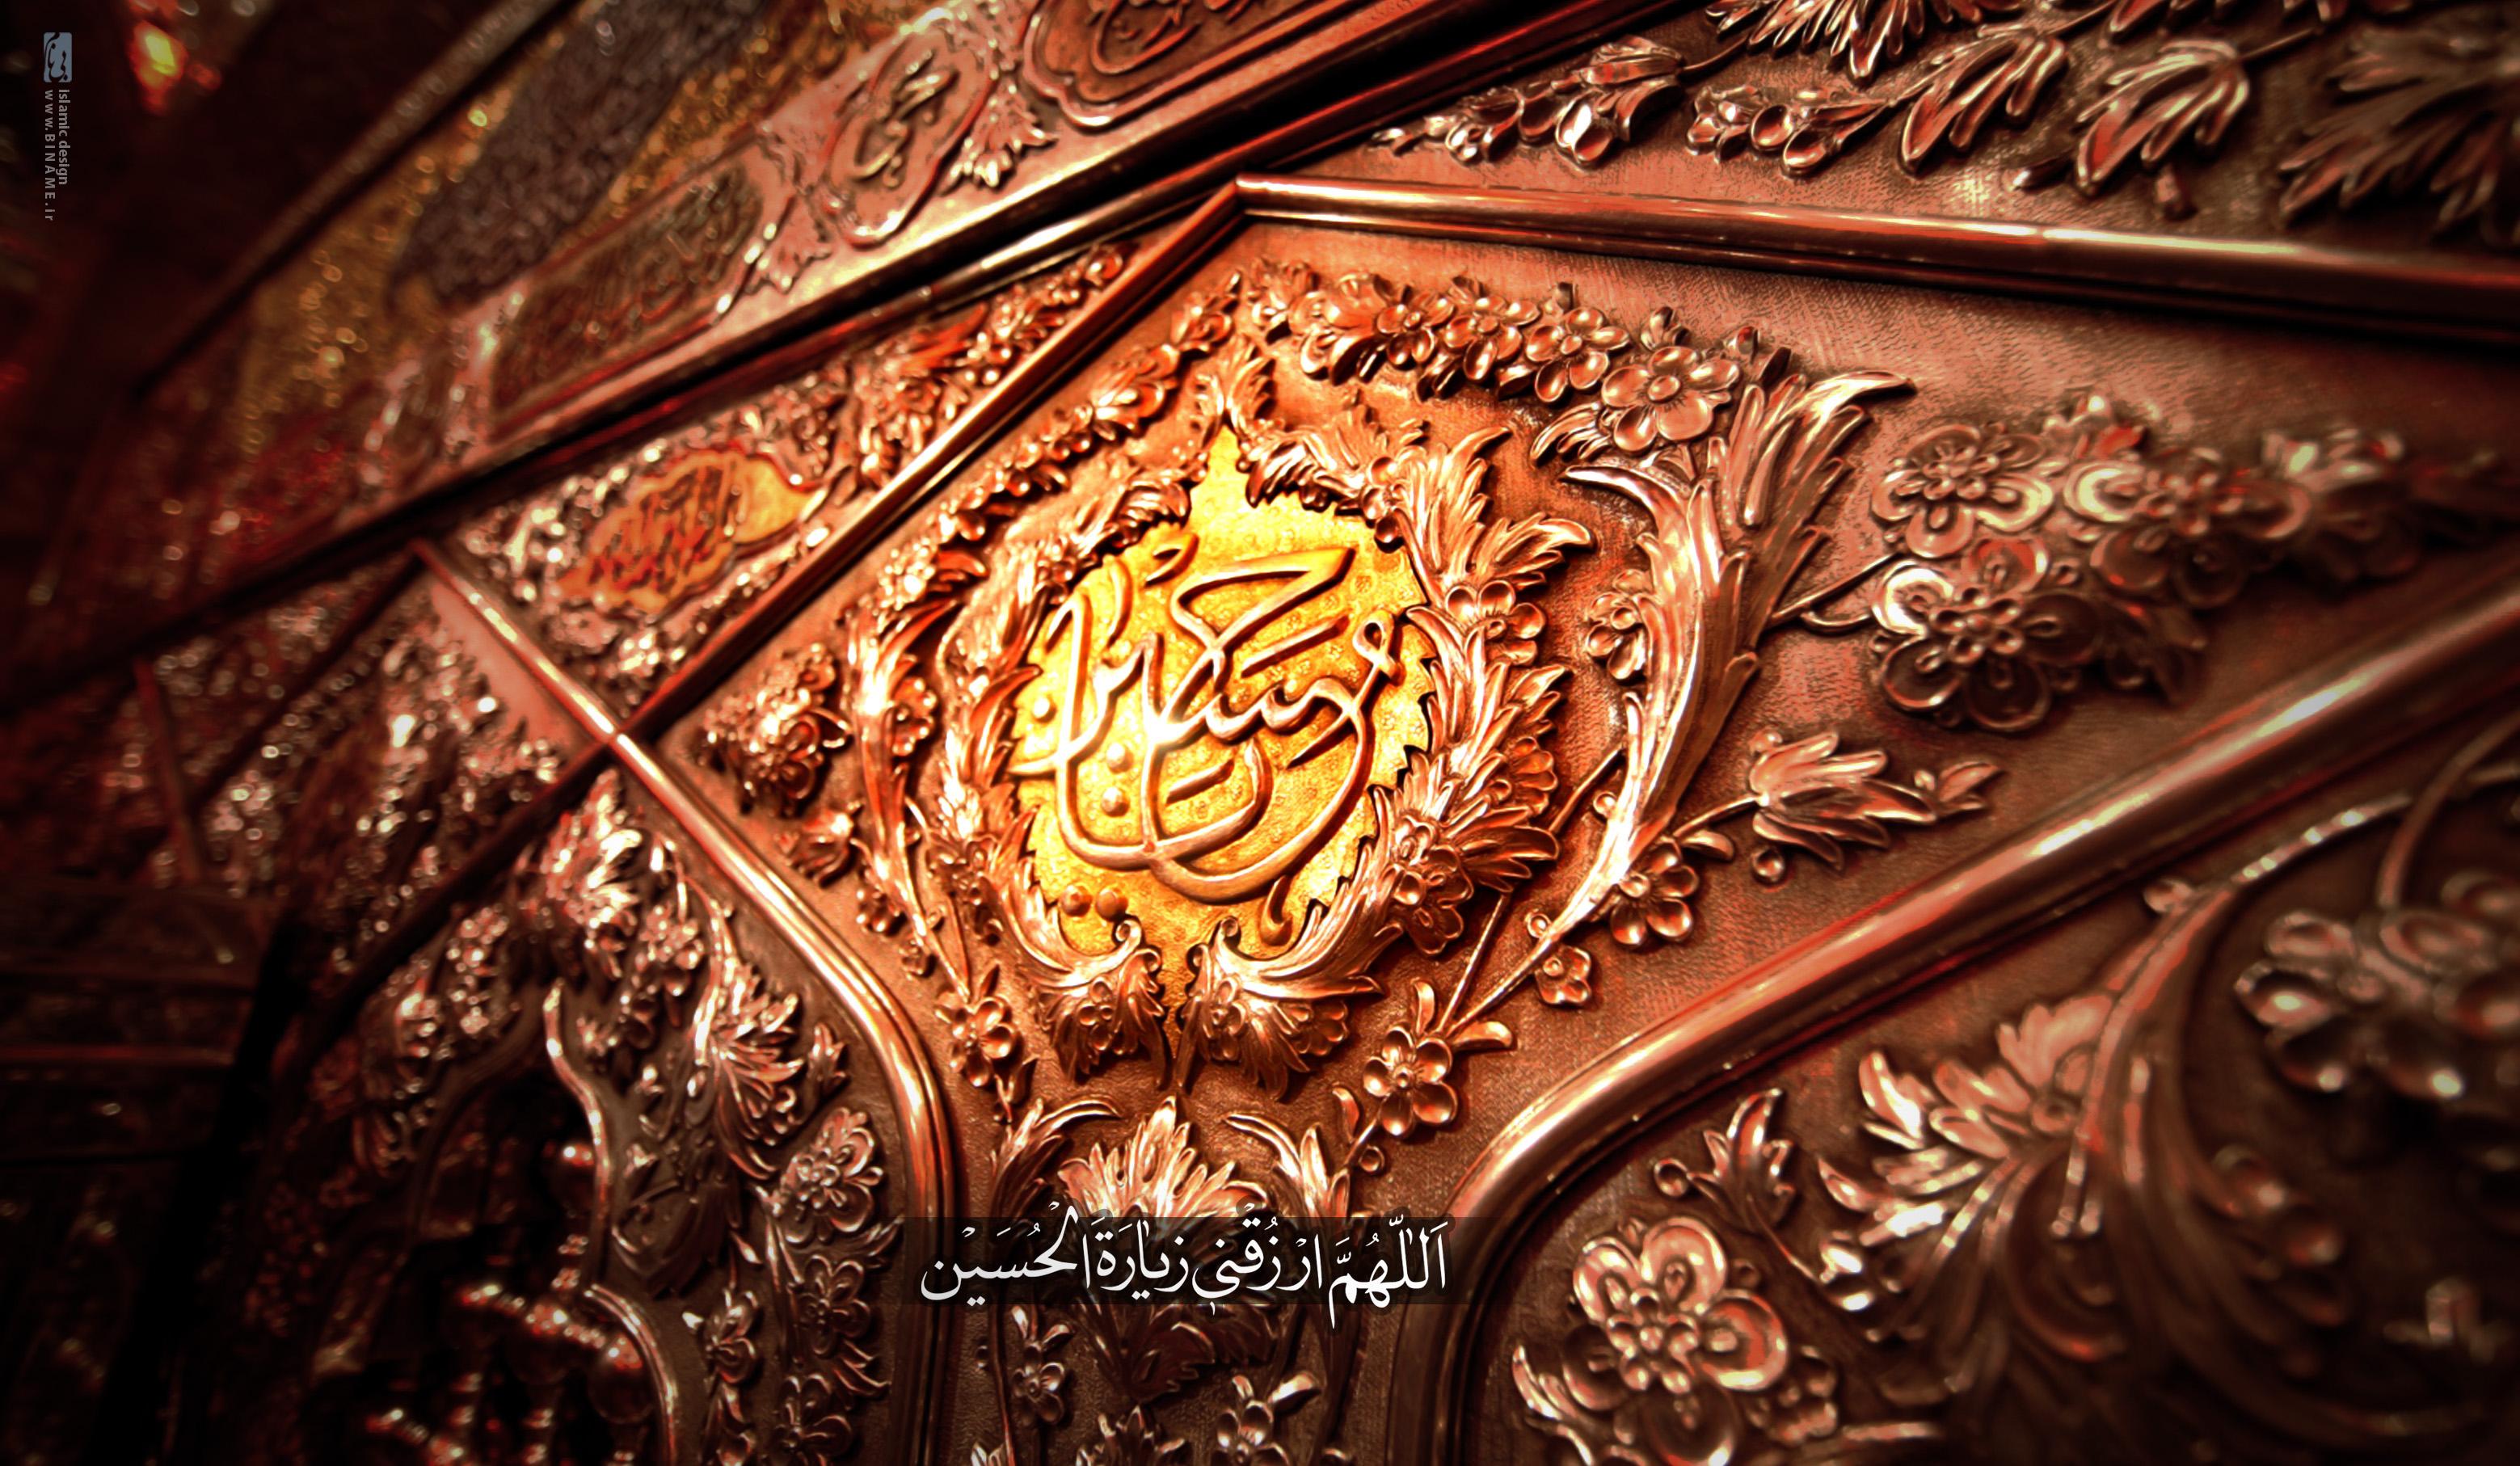 http://rashedsakhre.persiangig.com/image/fadakalzahra/Zarih-Imam-Hossain.jpg